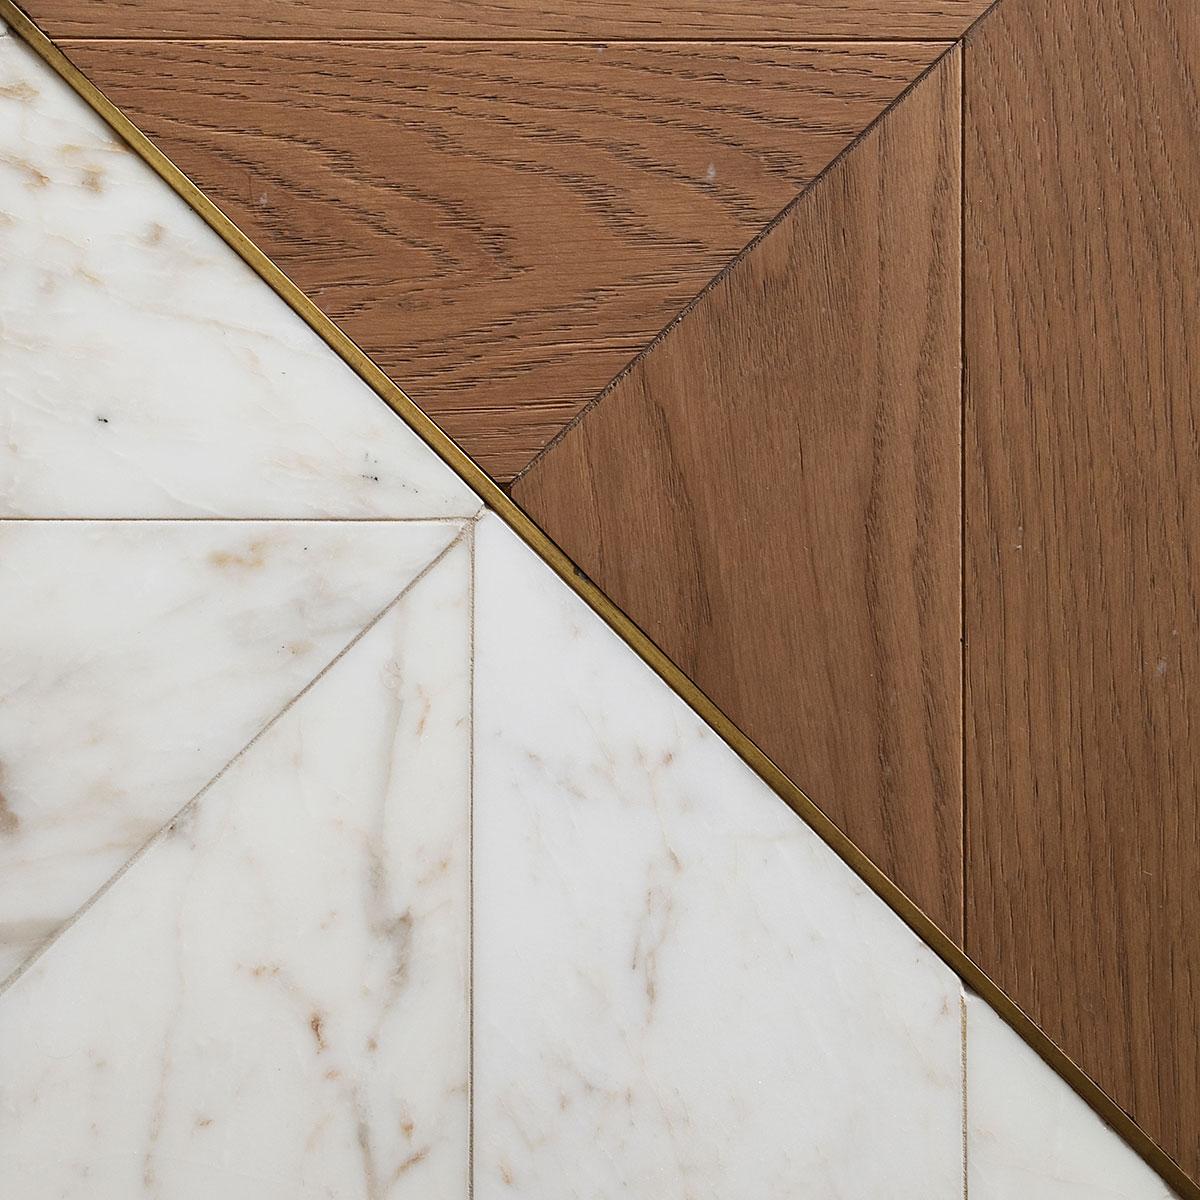 kickoffice casa dgr floor detail marble oak